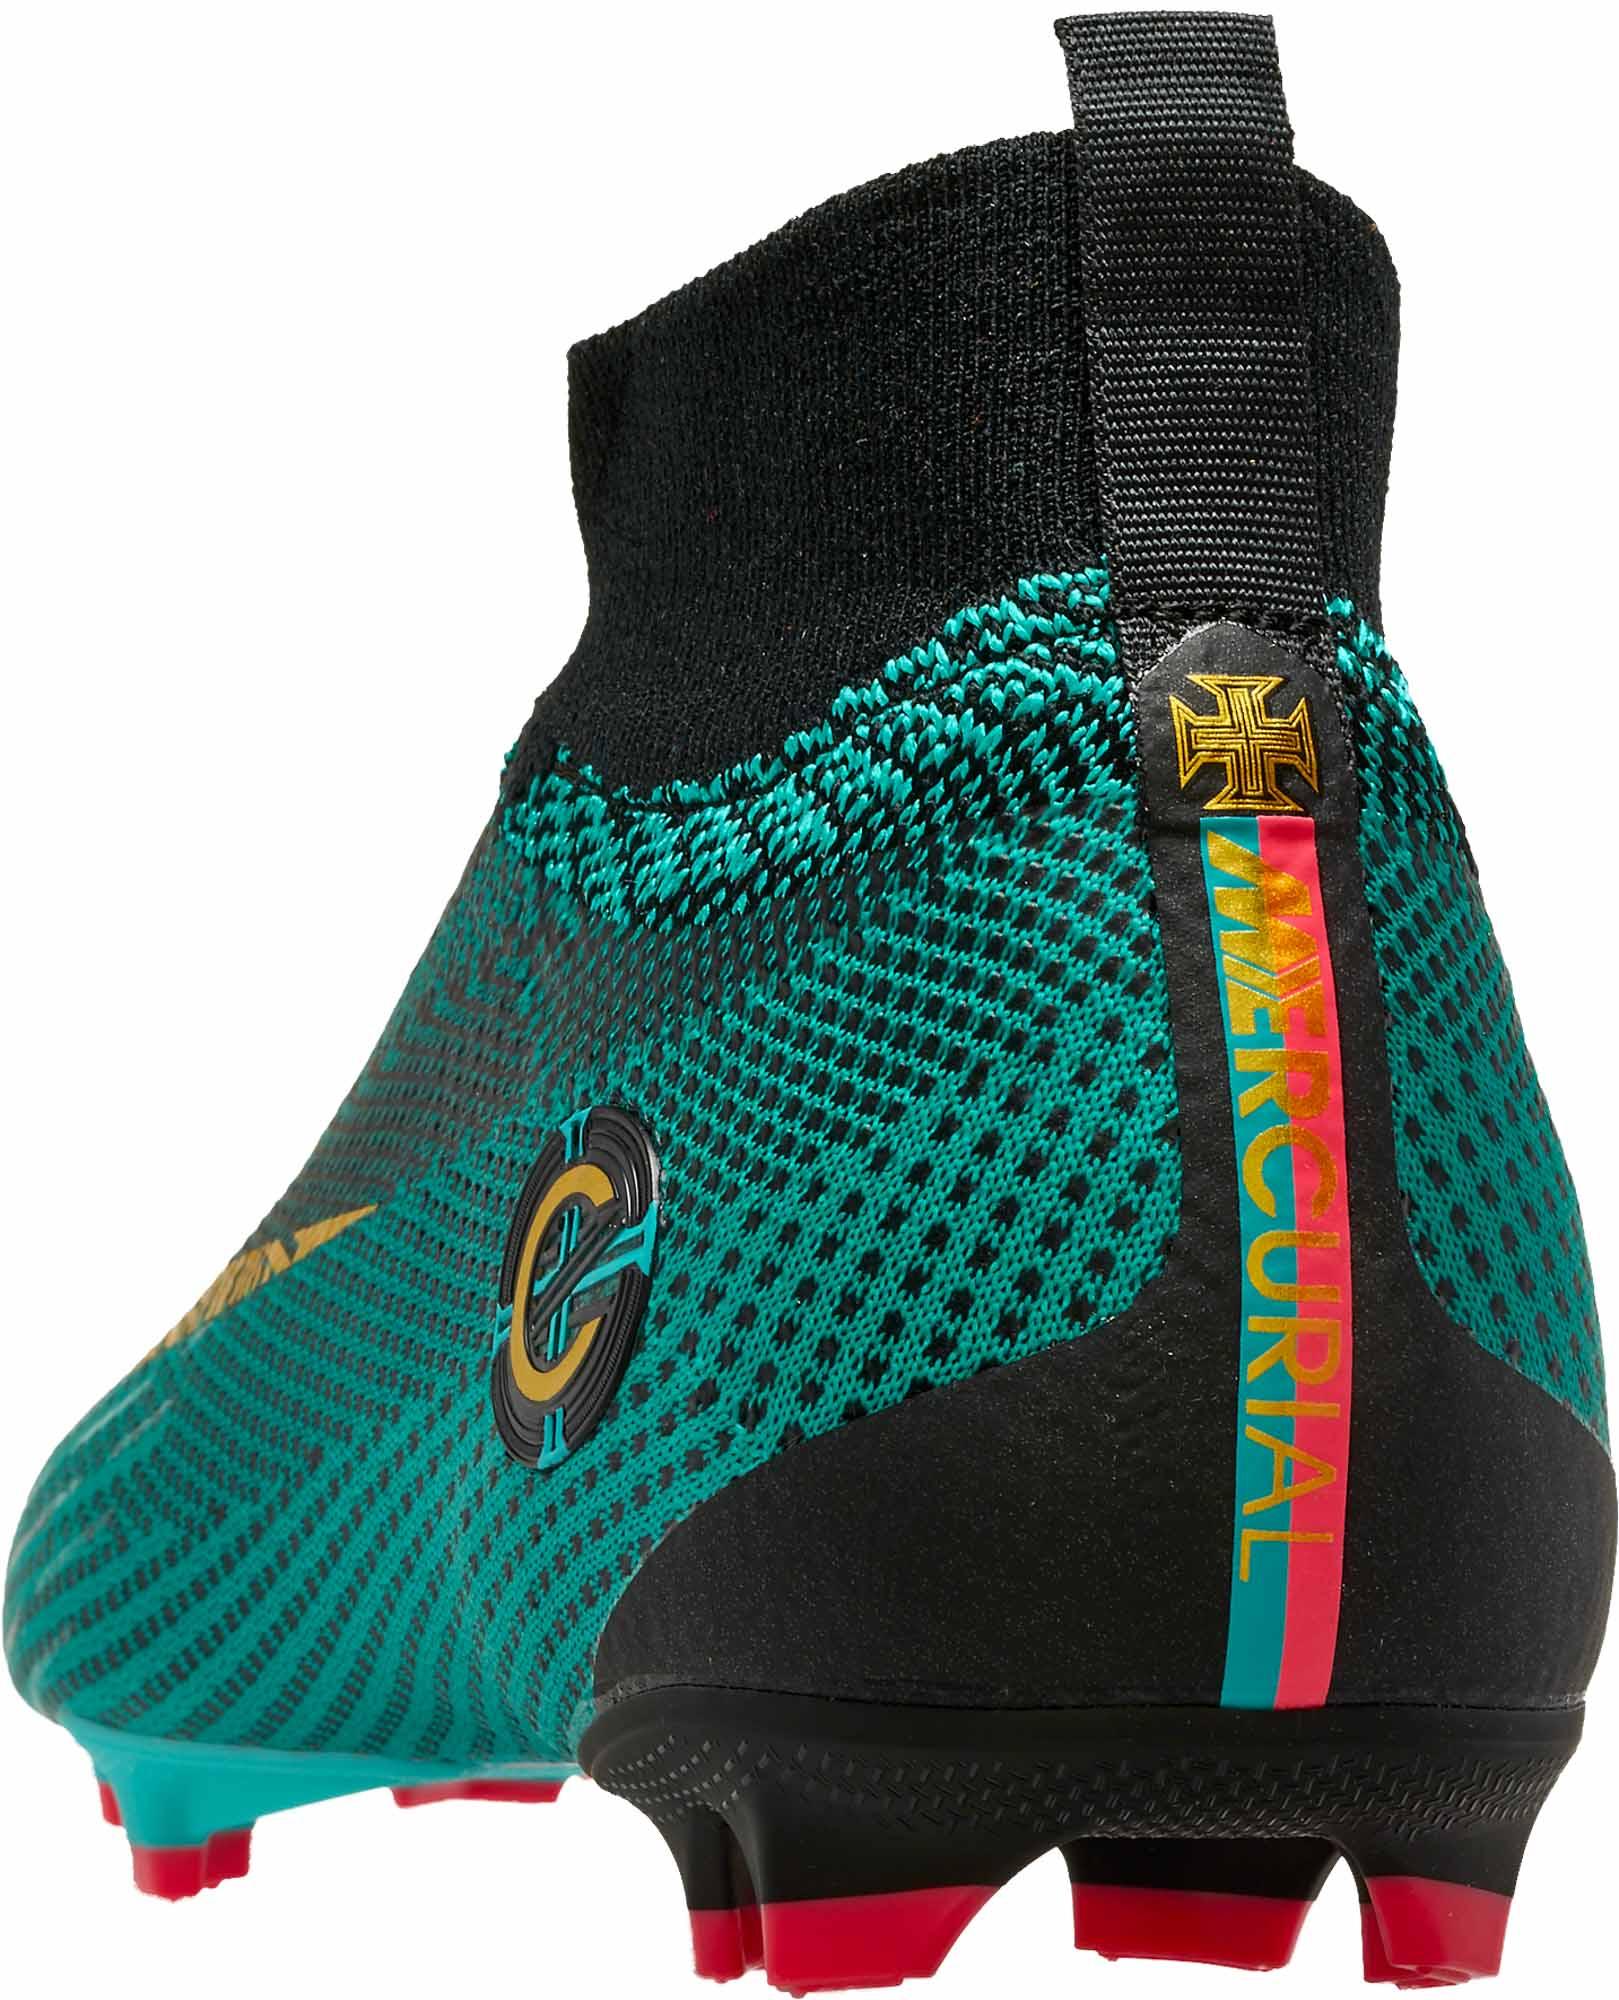 meet 5e8e9 7f670 Nike Kids Mercurial Superfly 6 Elite FG - CR7 Clear Jade